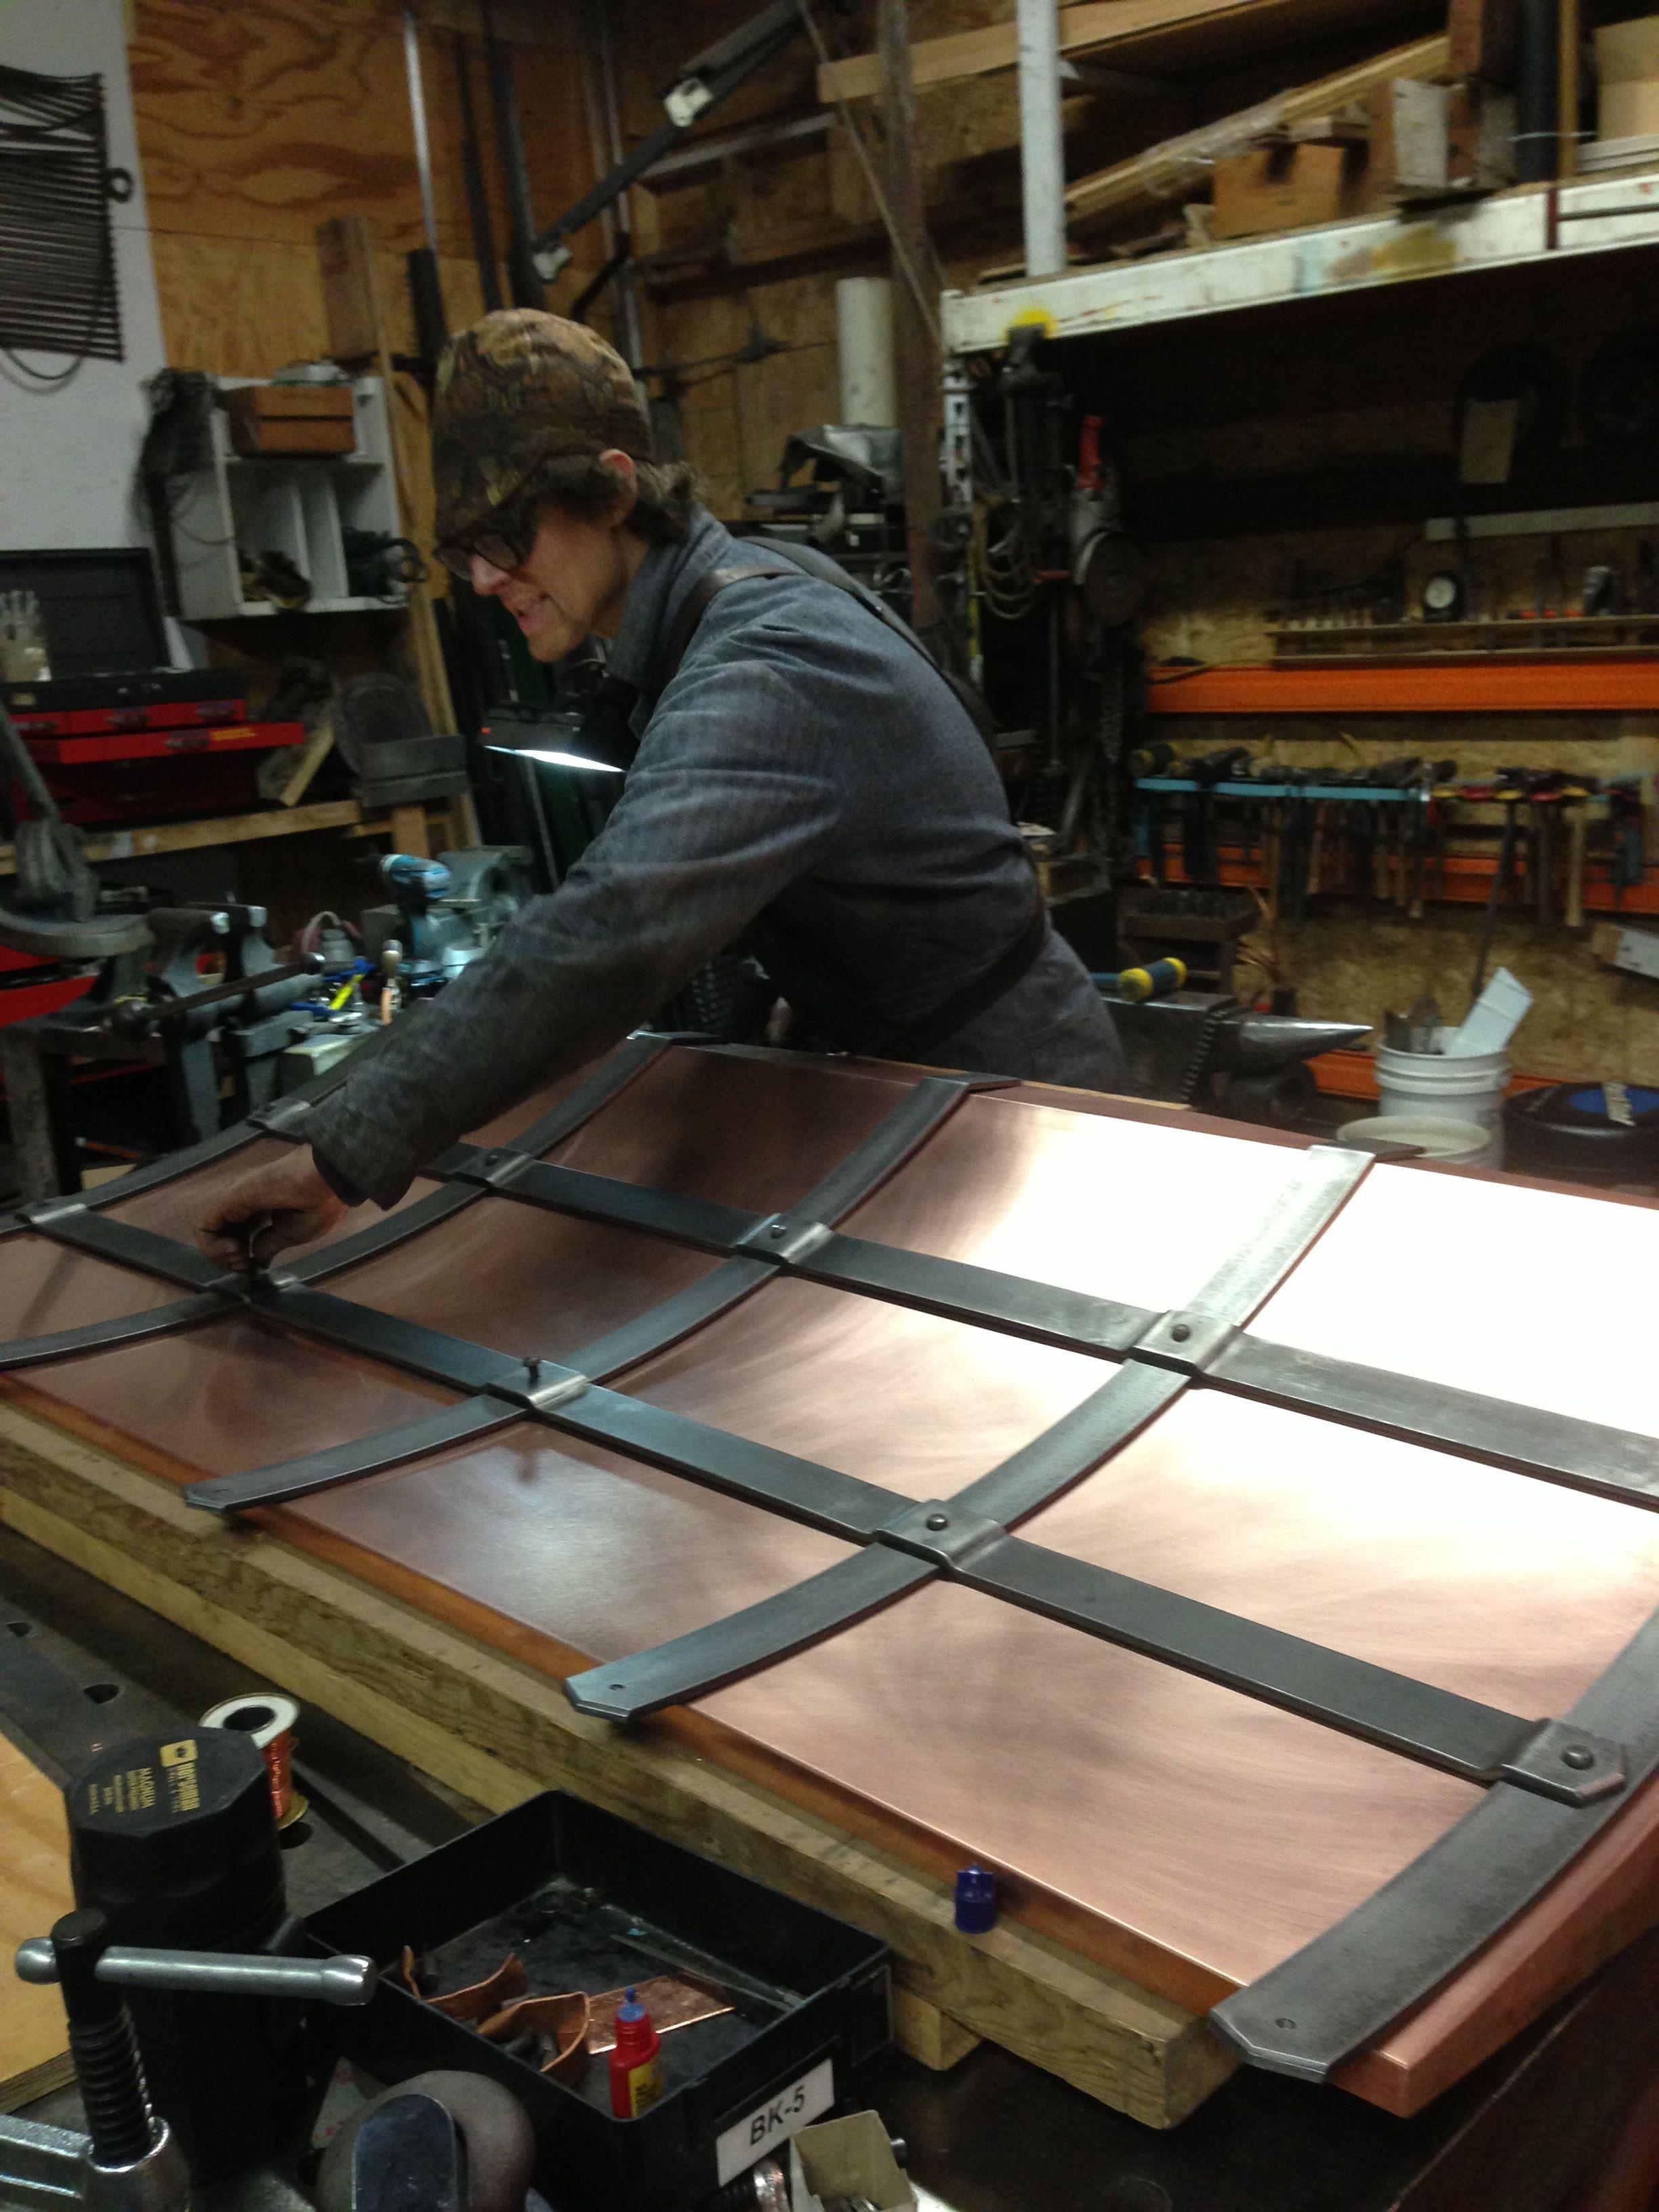 Copper Hood Work